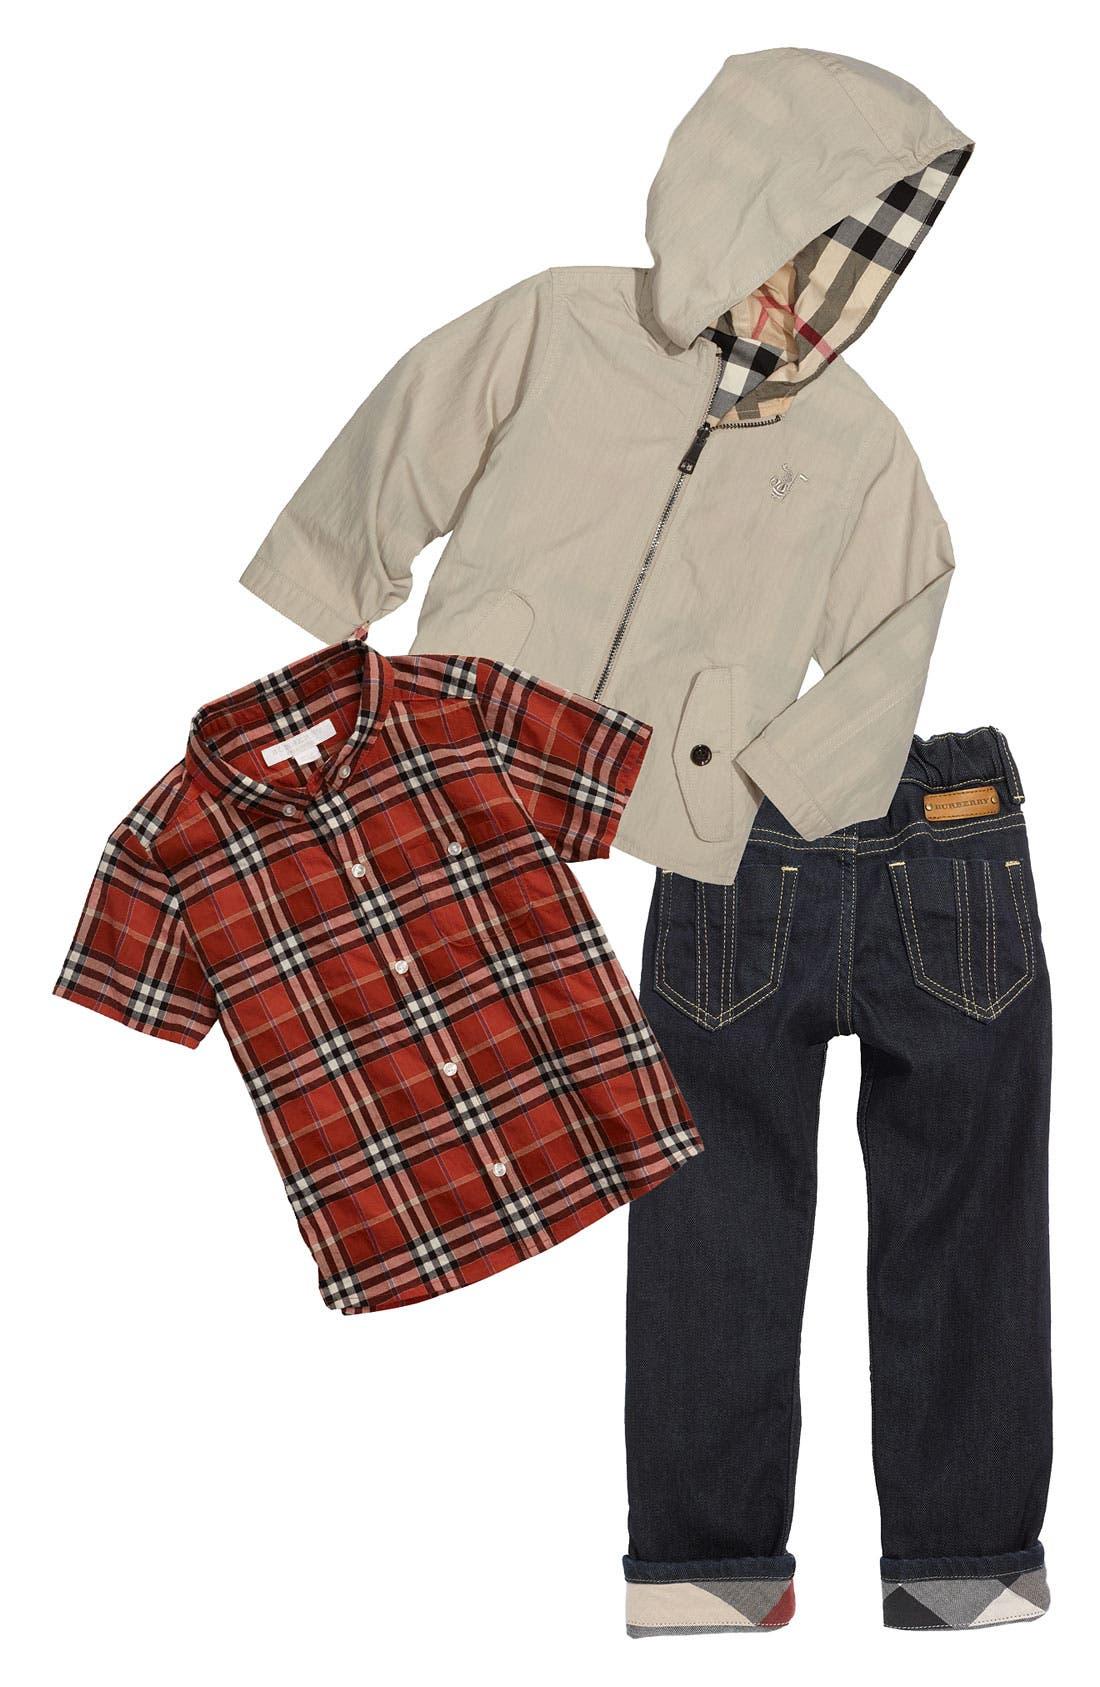 Alternate Image 1 Selected - Burberry Jacket, Shirt & Jeans (Toddler)